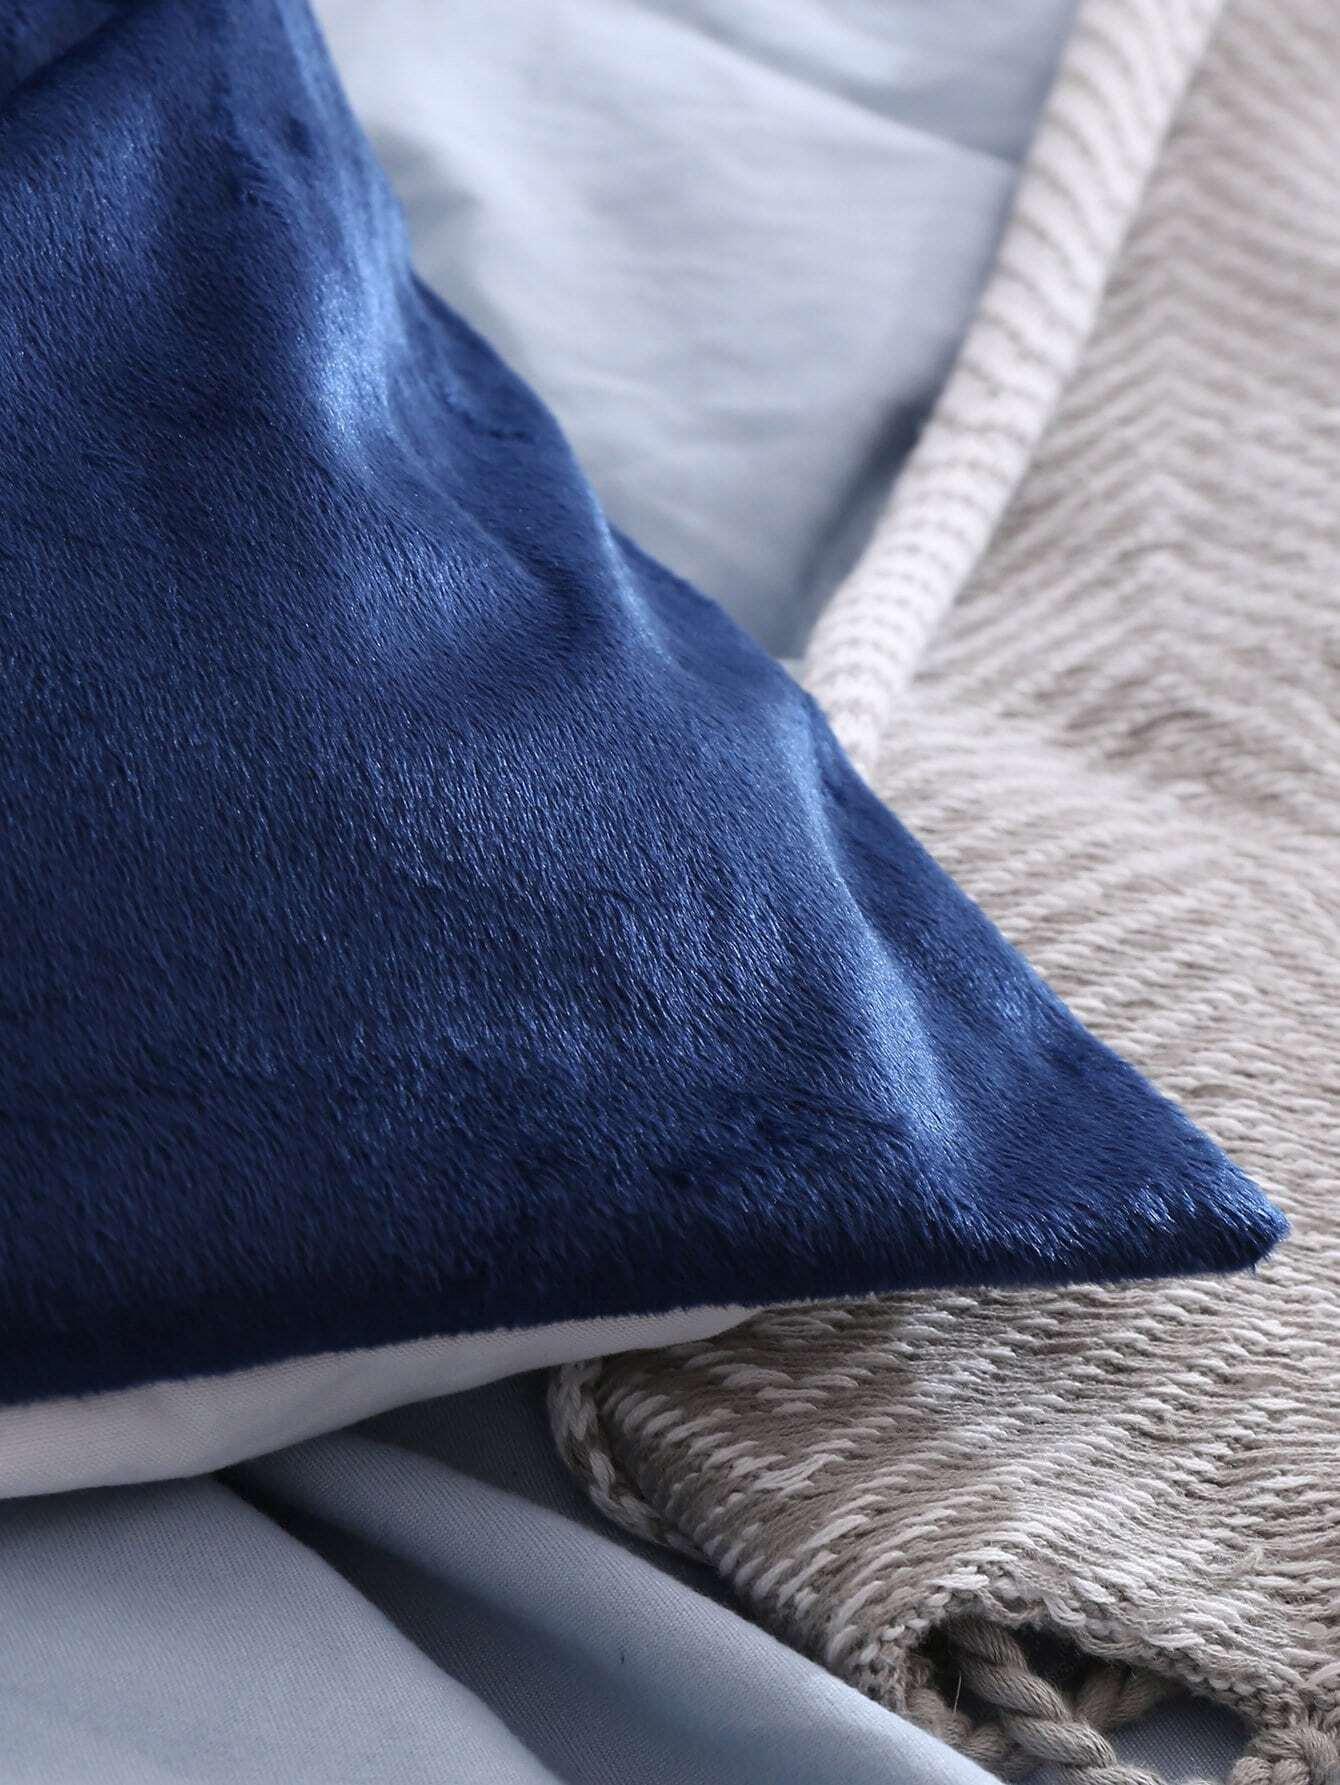 bettlaken set mit farbblock muster german shein sheinside. Black Bedroom Furniture Sets. Home Design Ideas